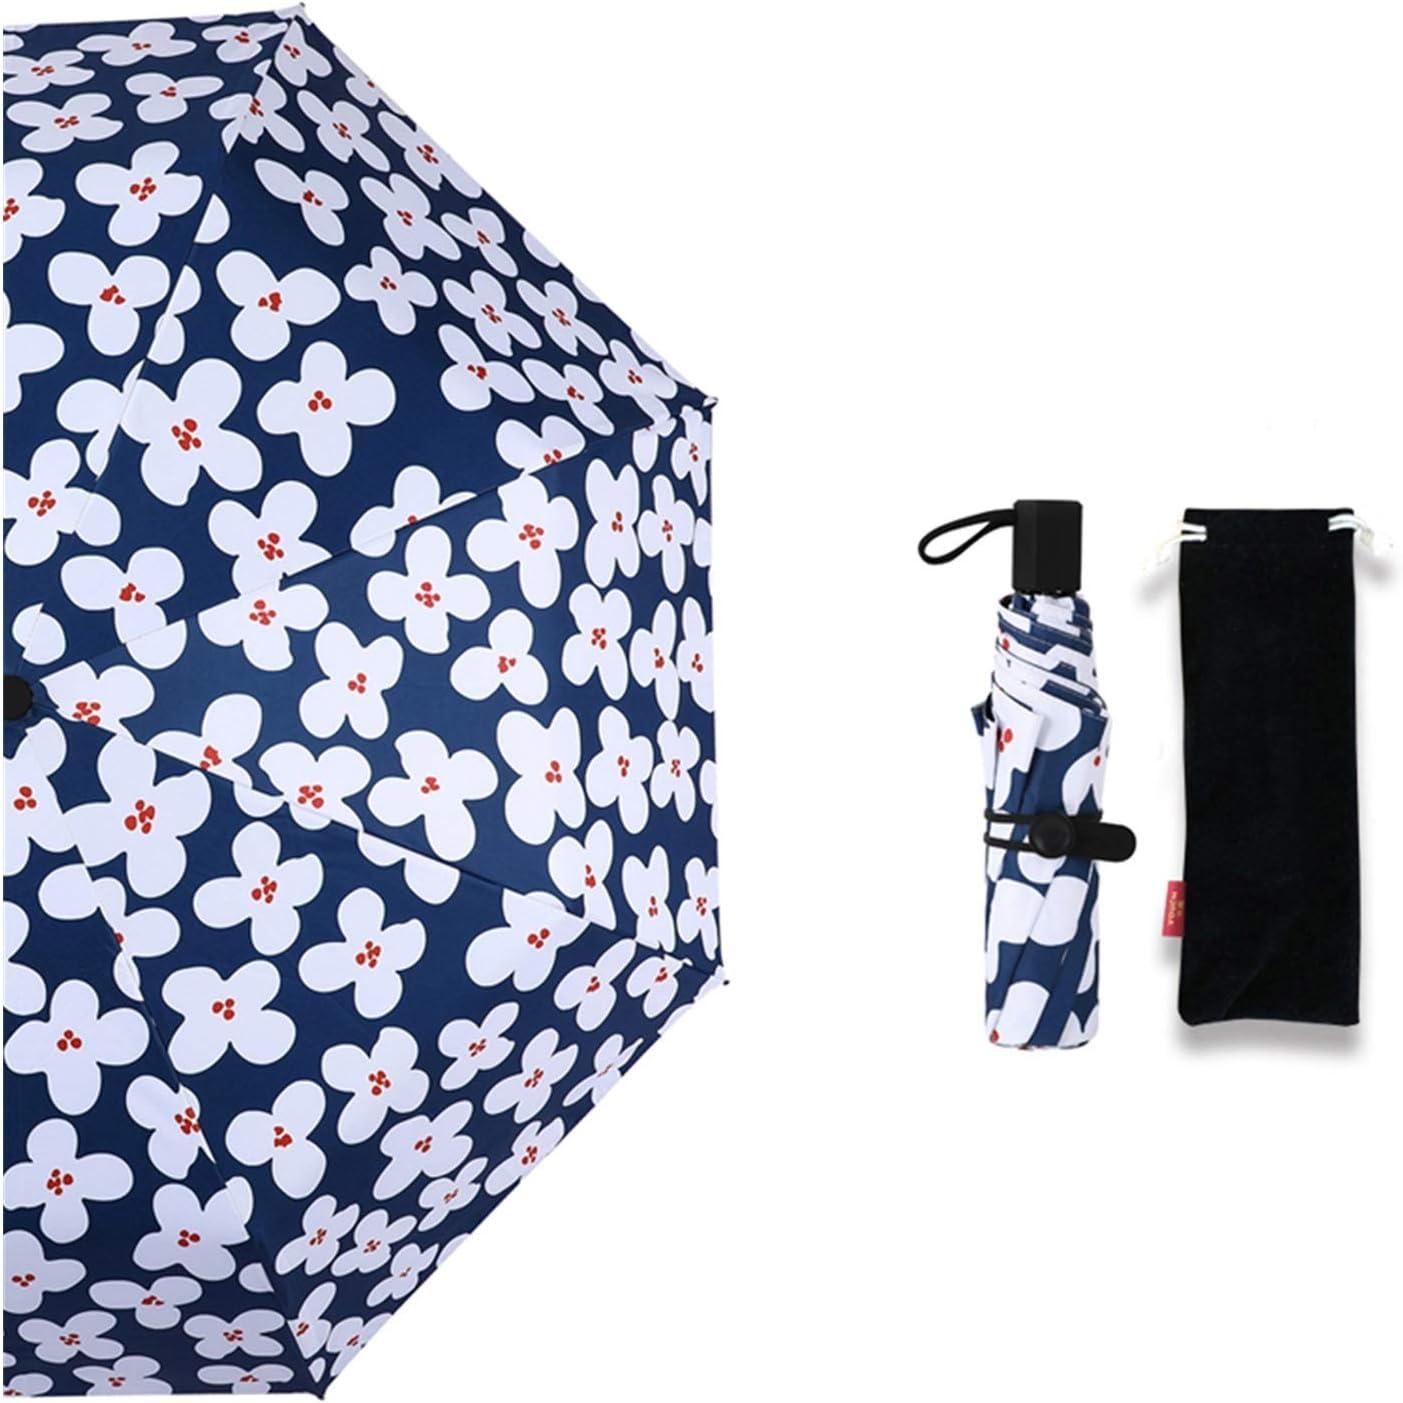 YXIUER Style Flowers Mini Folding Super Direct sale of manufacturer popular specialty store Umbrella Women Umb or Rain Sun